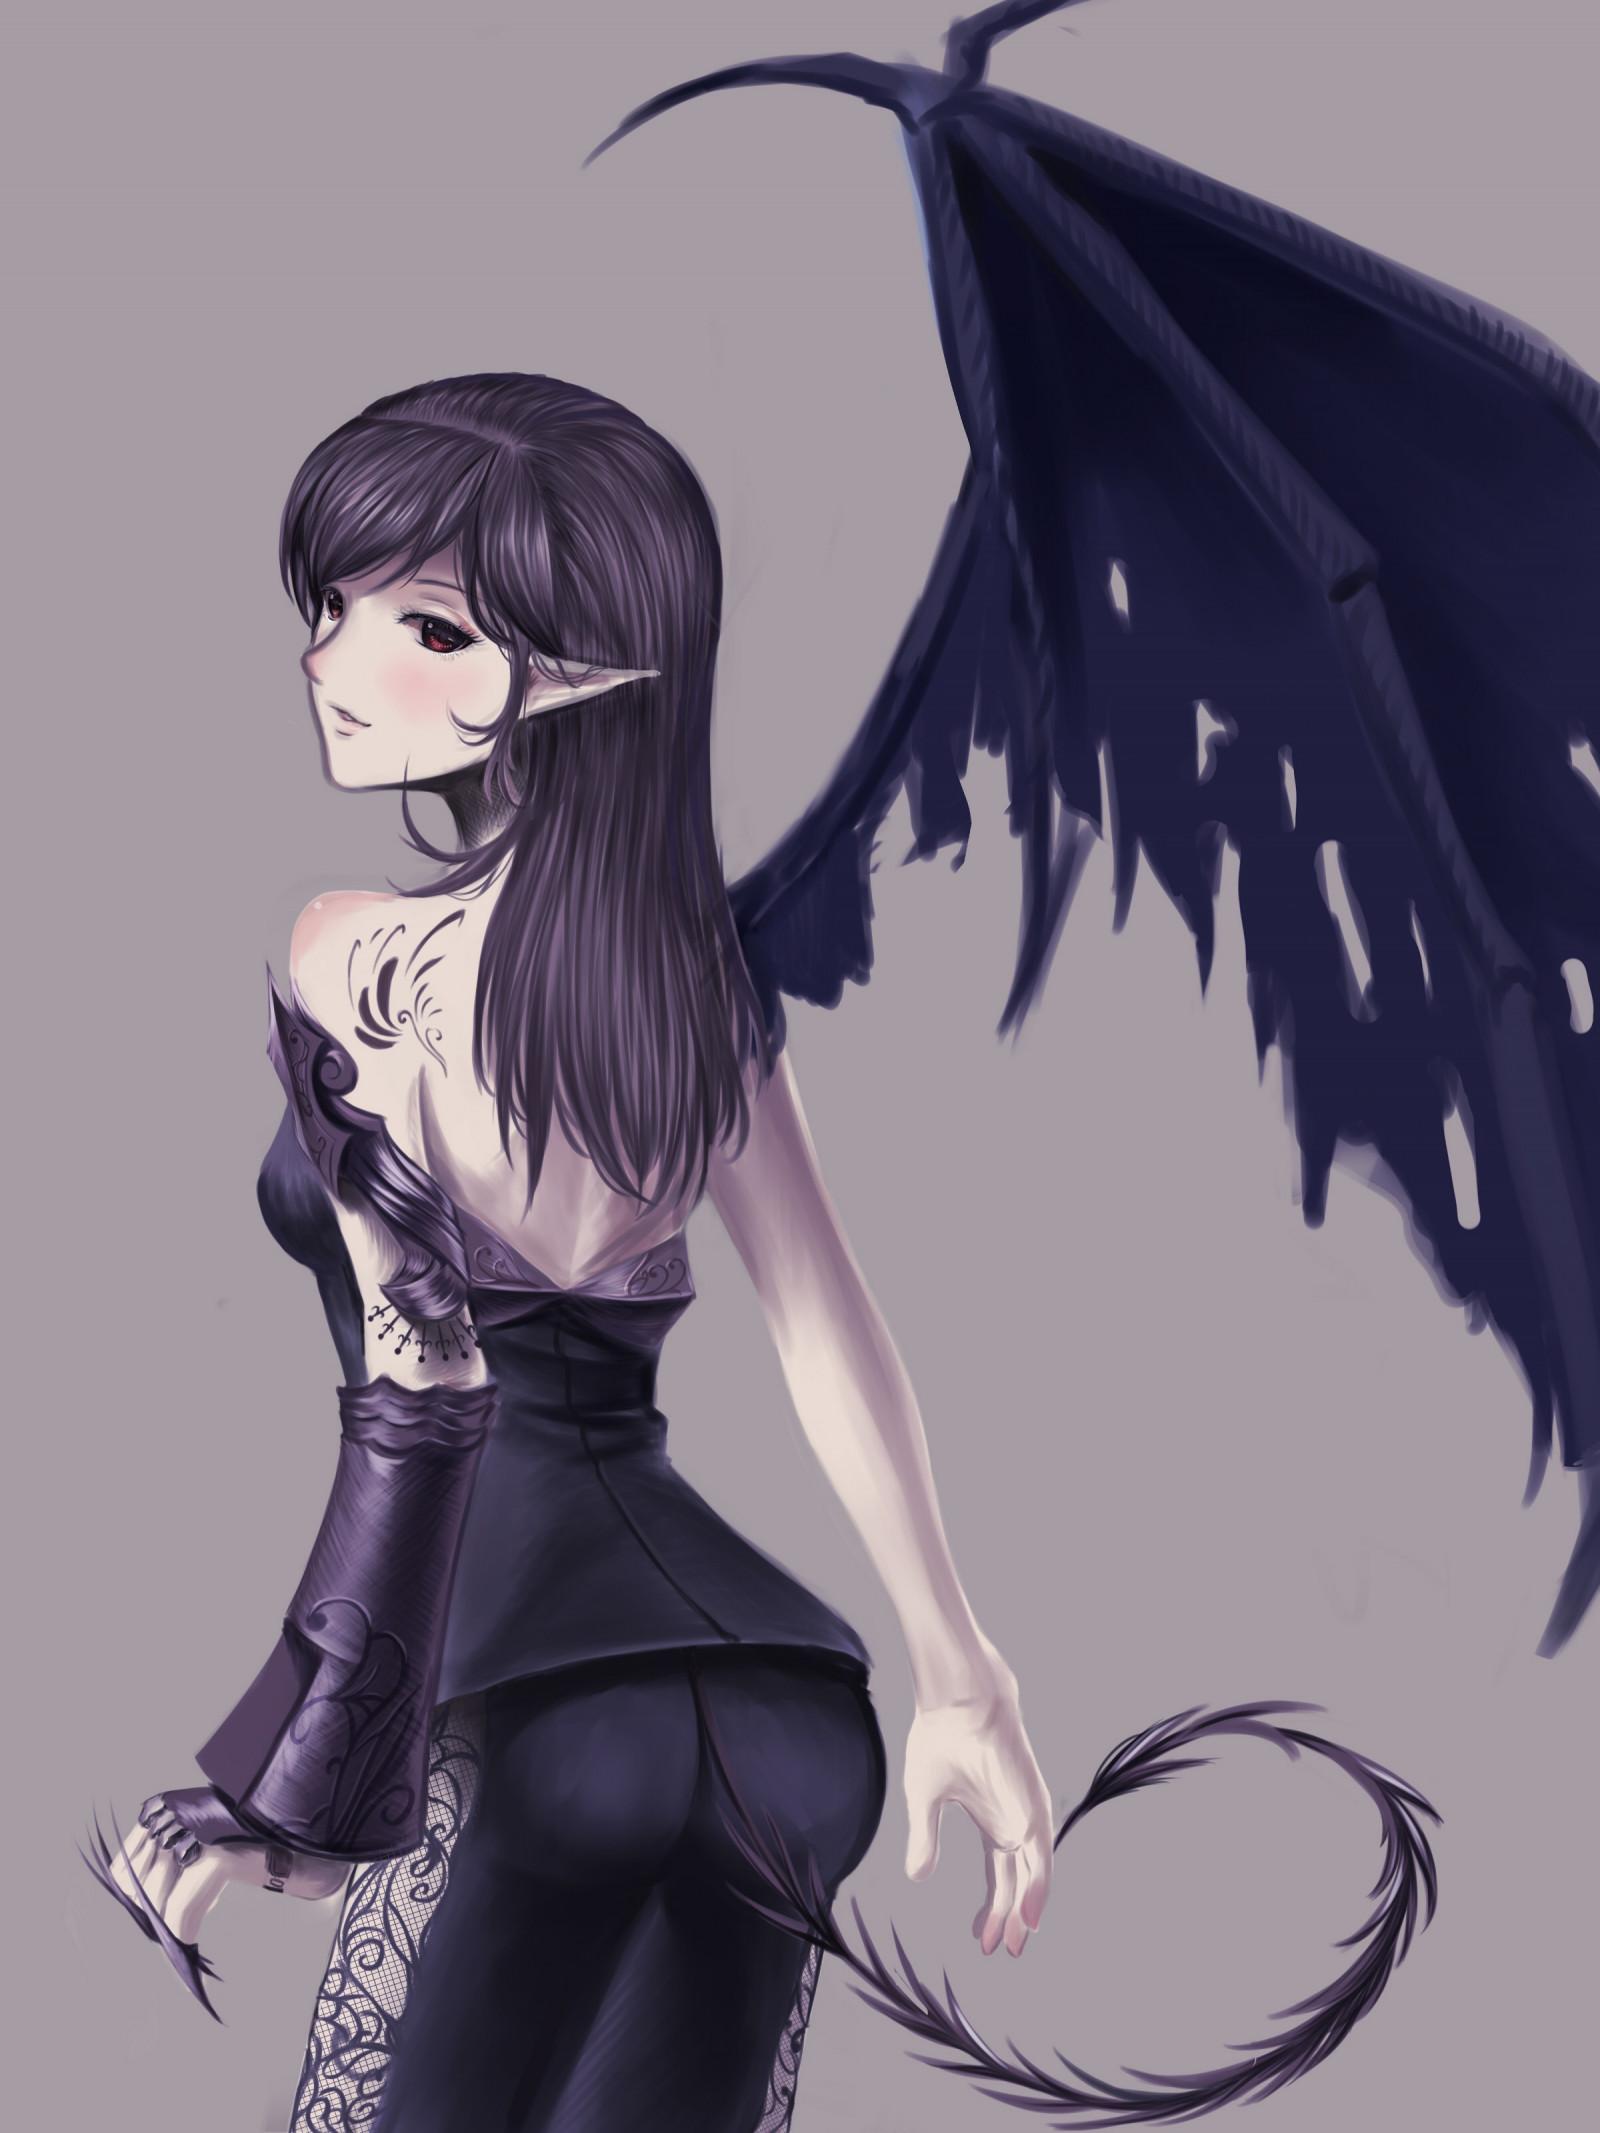 Fond D Ecran Illustration Cheveux Longs Anime Filles Anime